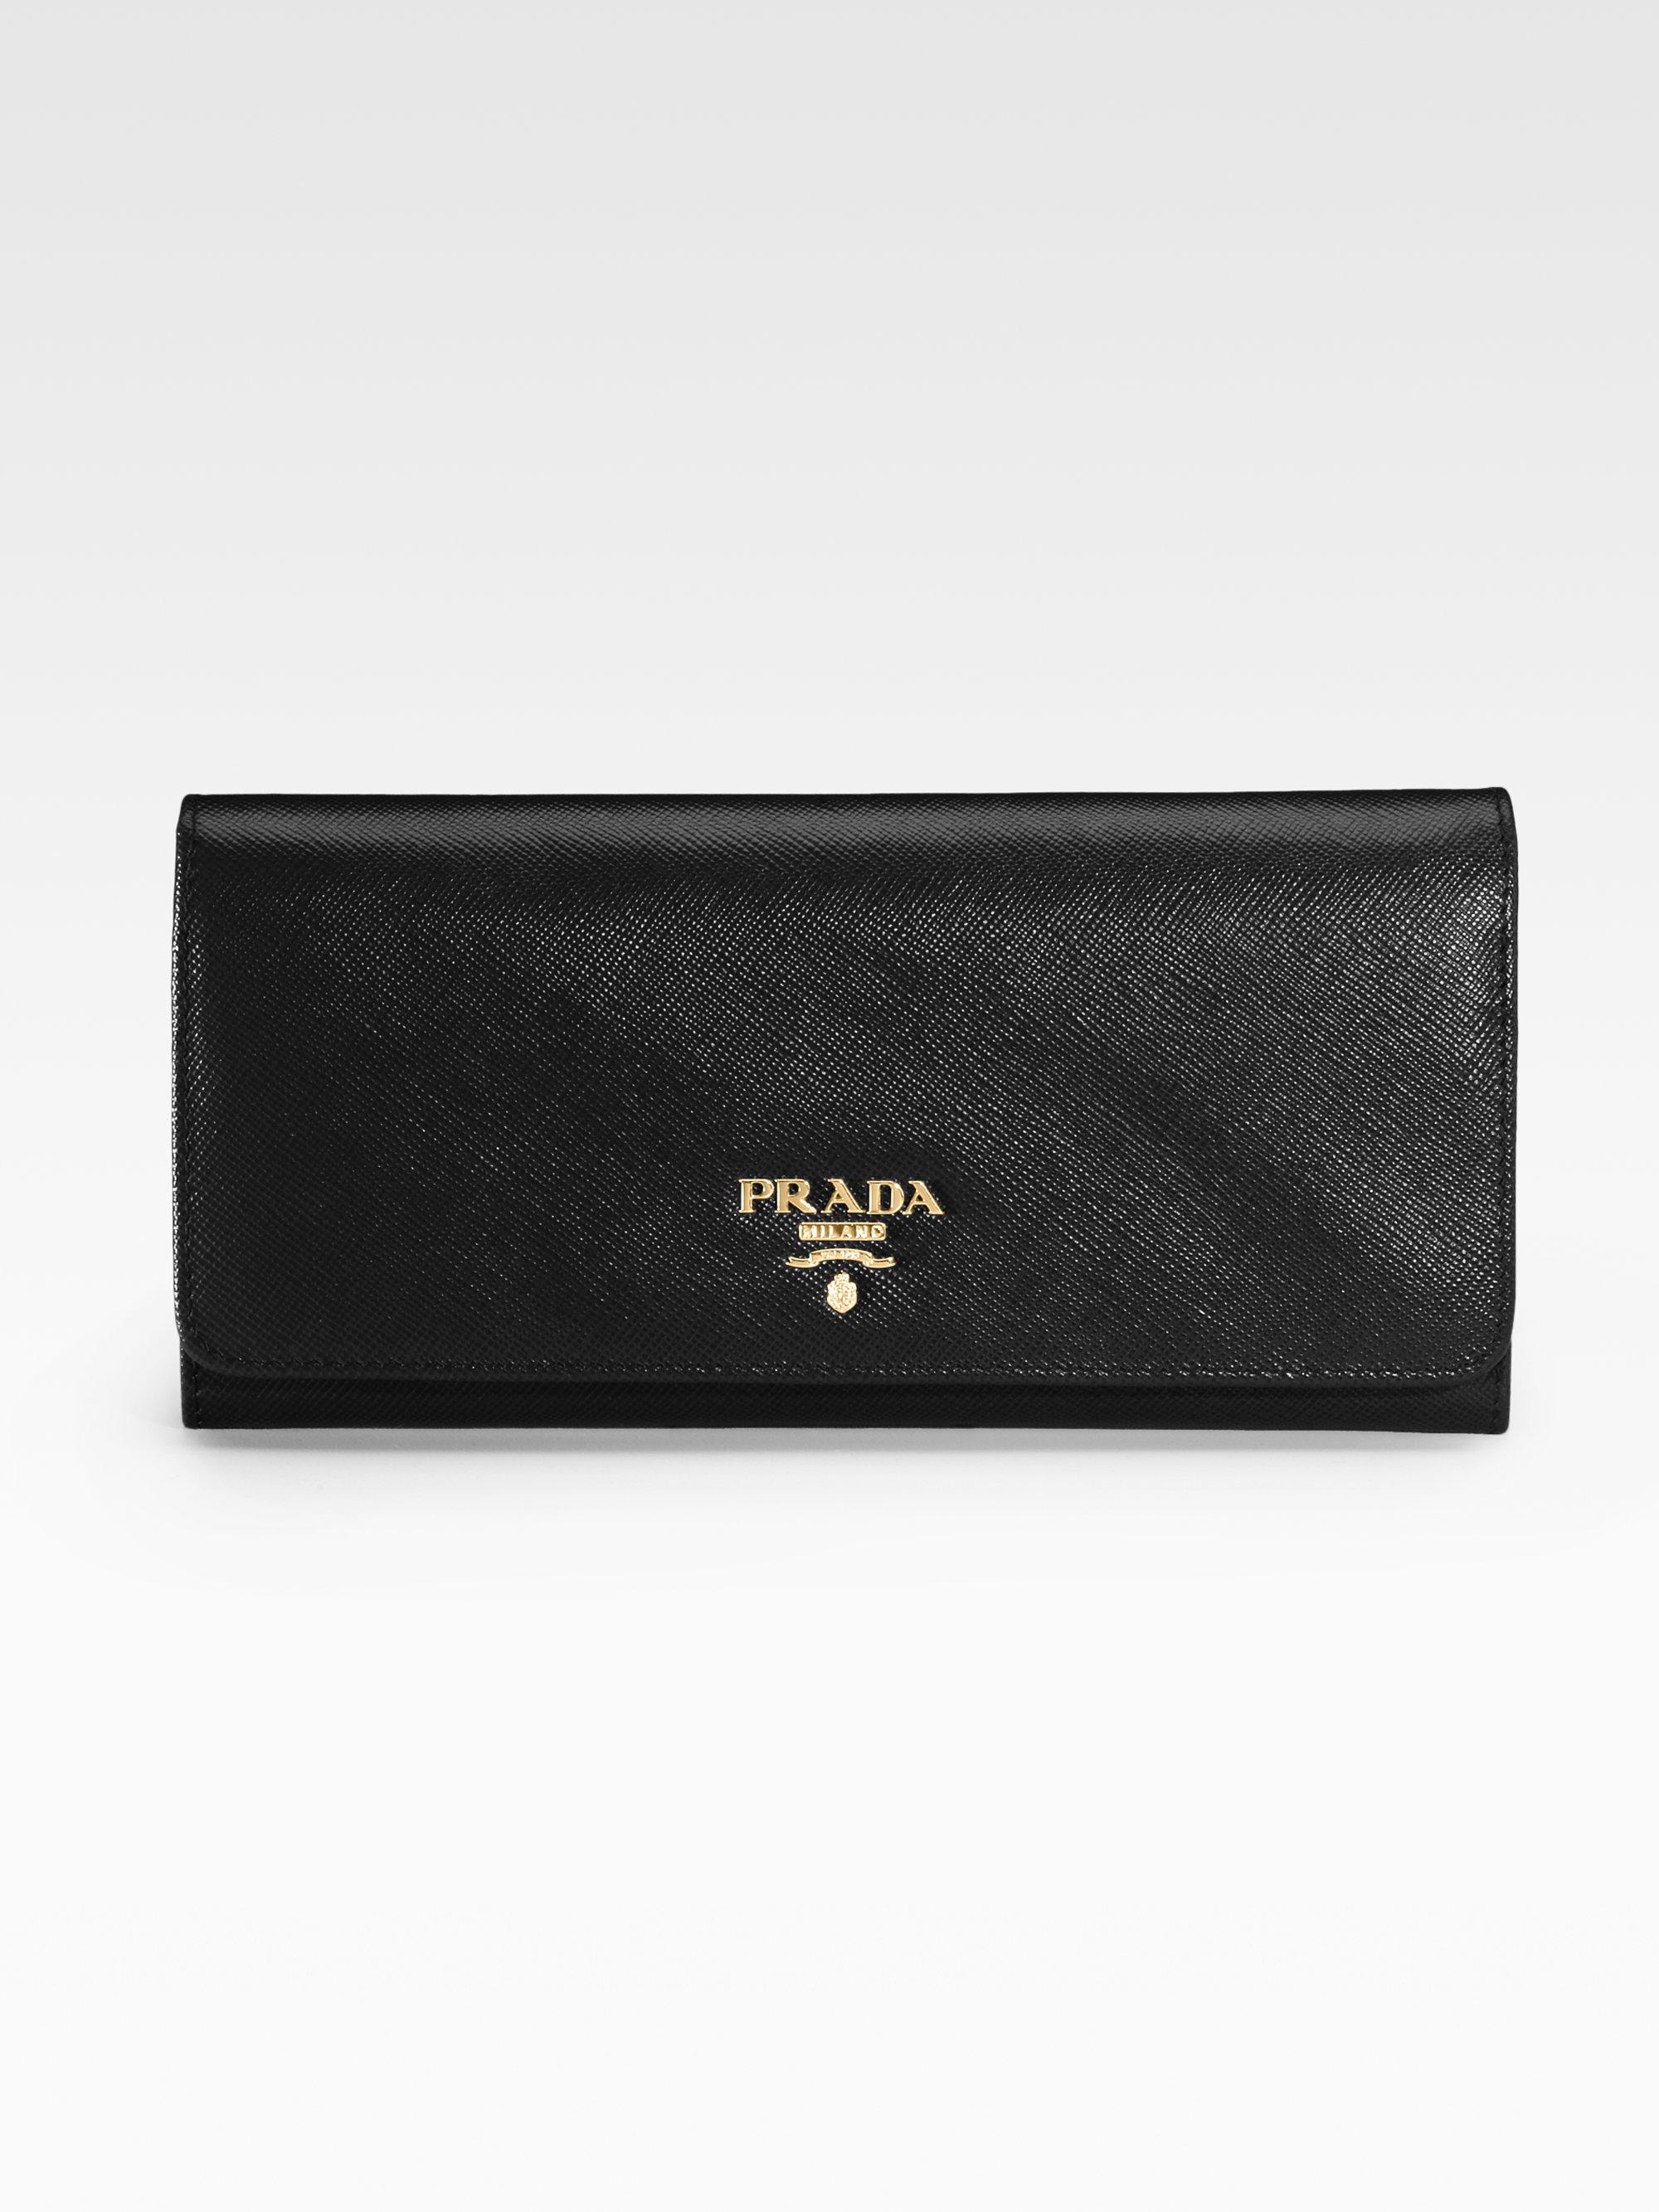 a30335b3 ireland prada saffiano corner wallet c6f3b b76ed